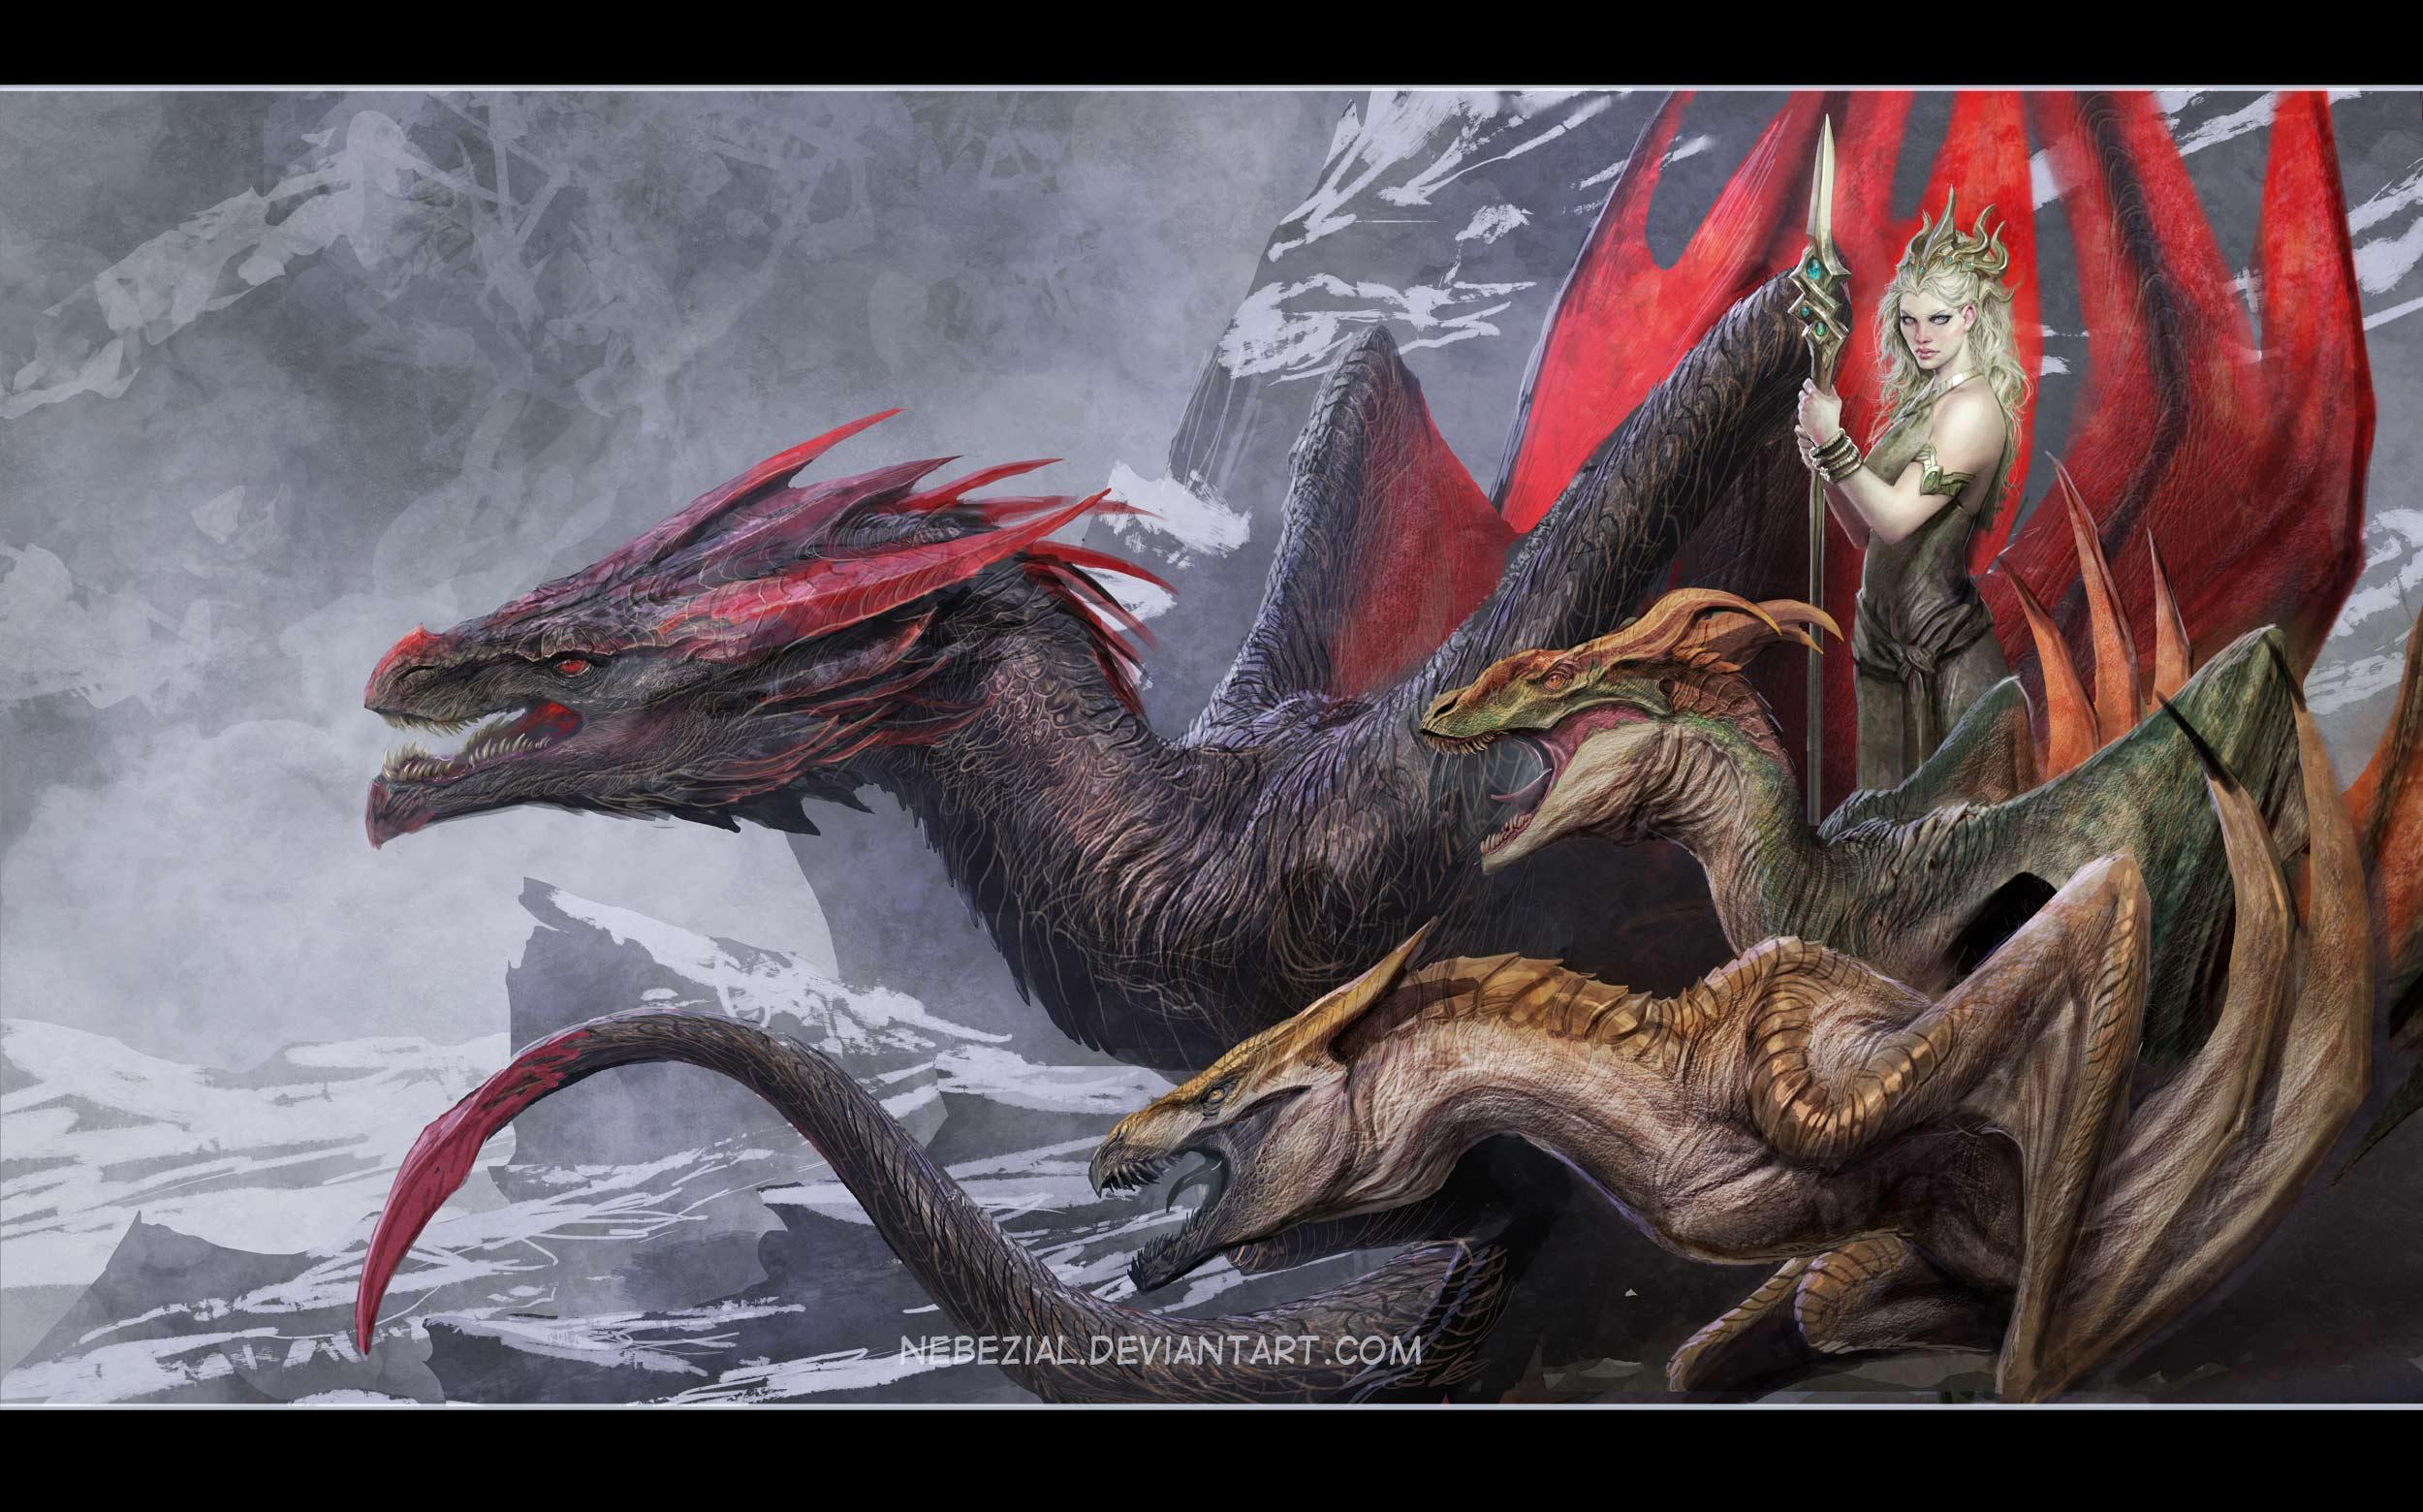 so_it_turns_out_it_was_daenerys____who_knew___xd_by_nebezial-d6wrob5